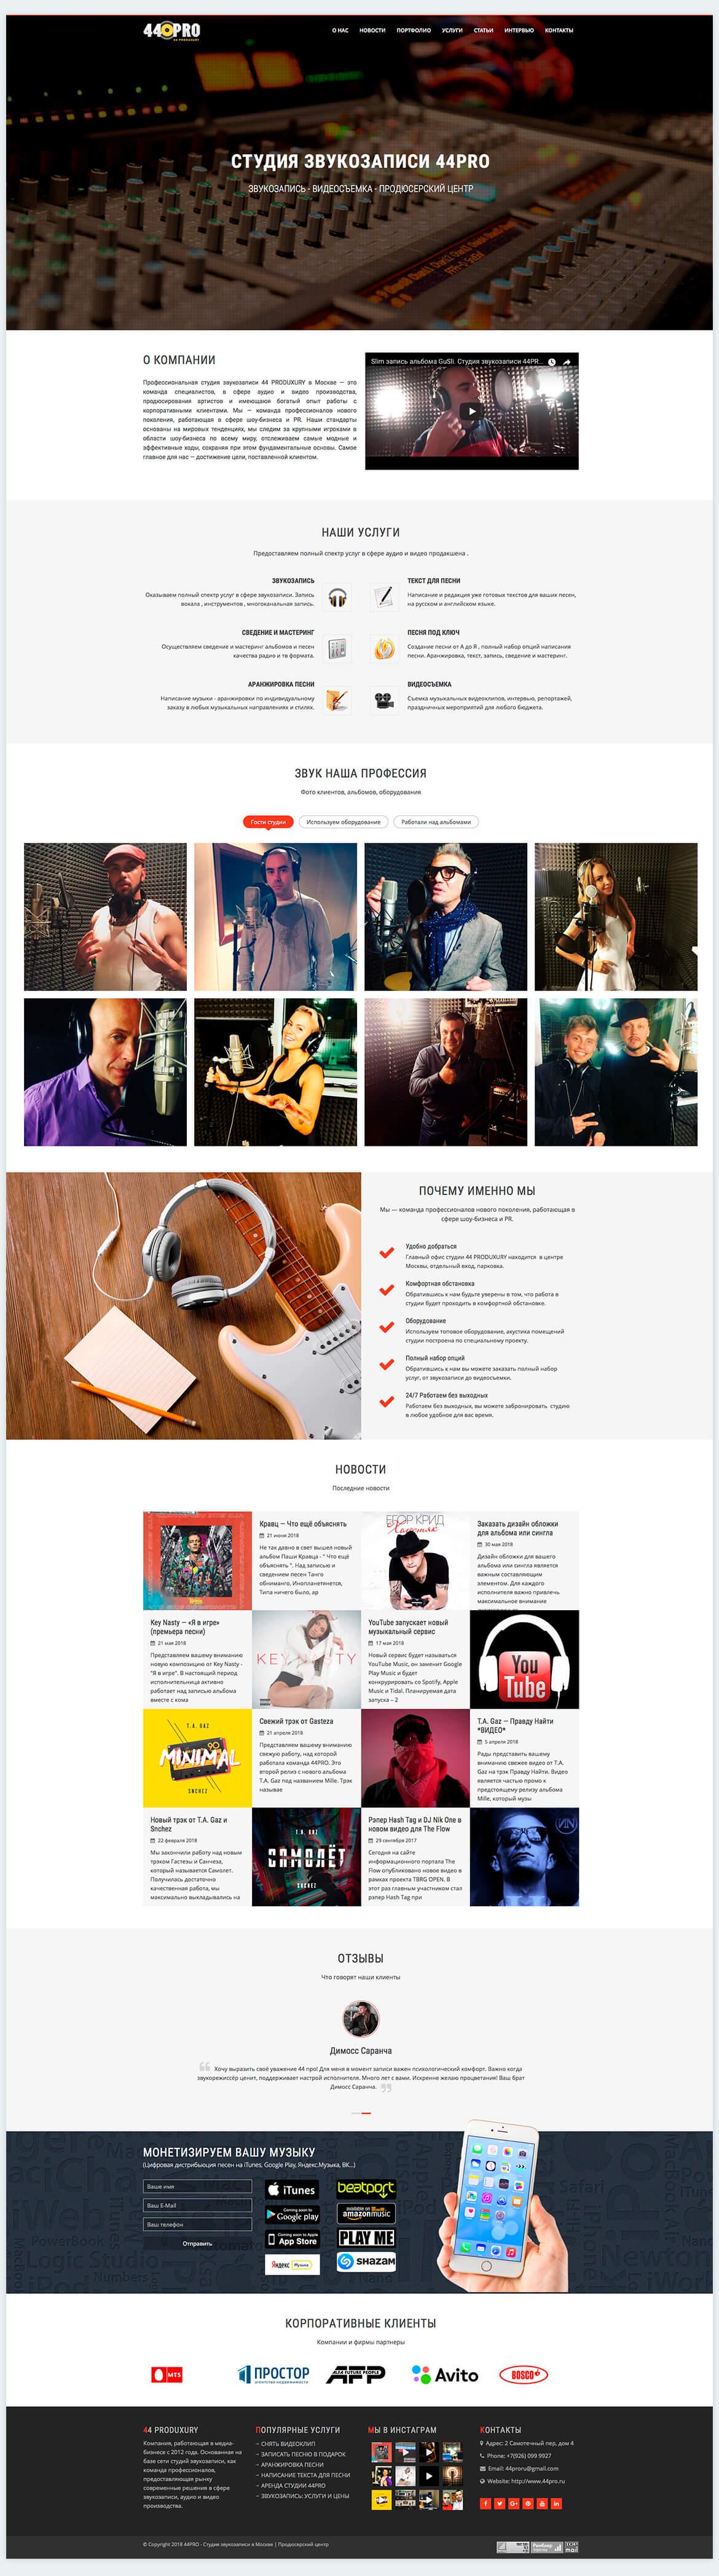 Разработка сайта 44pro от веб-студии VILION.PRO